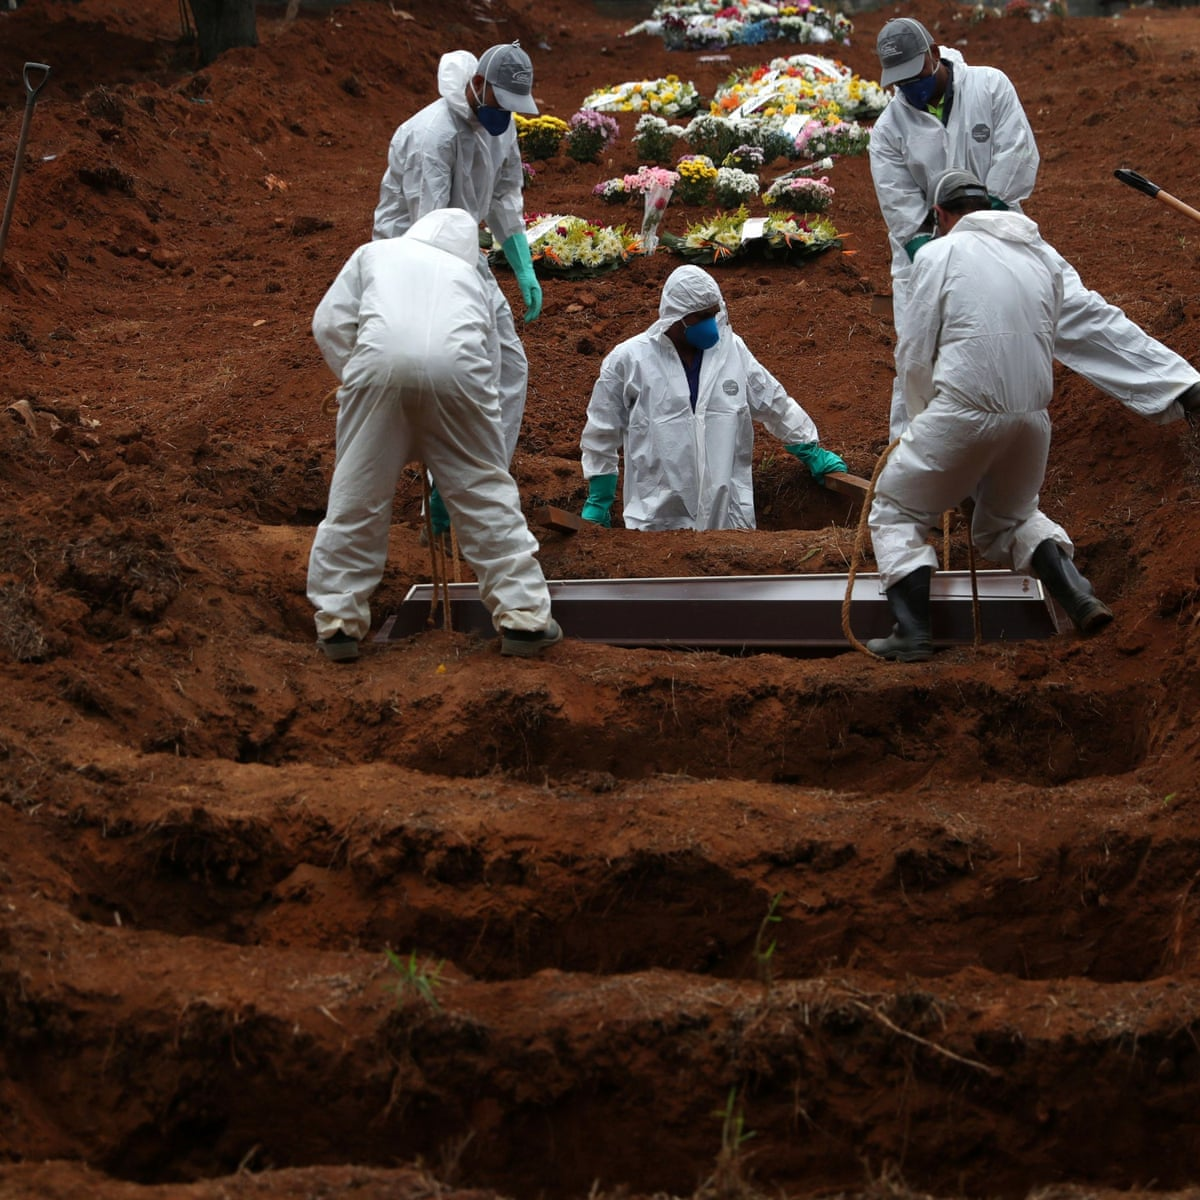 Brazil registers 42,720 coronavirus deaths